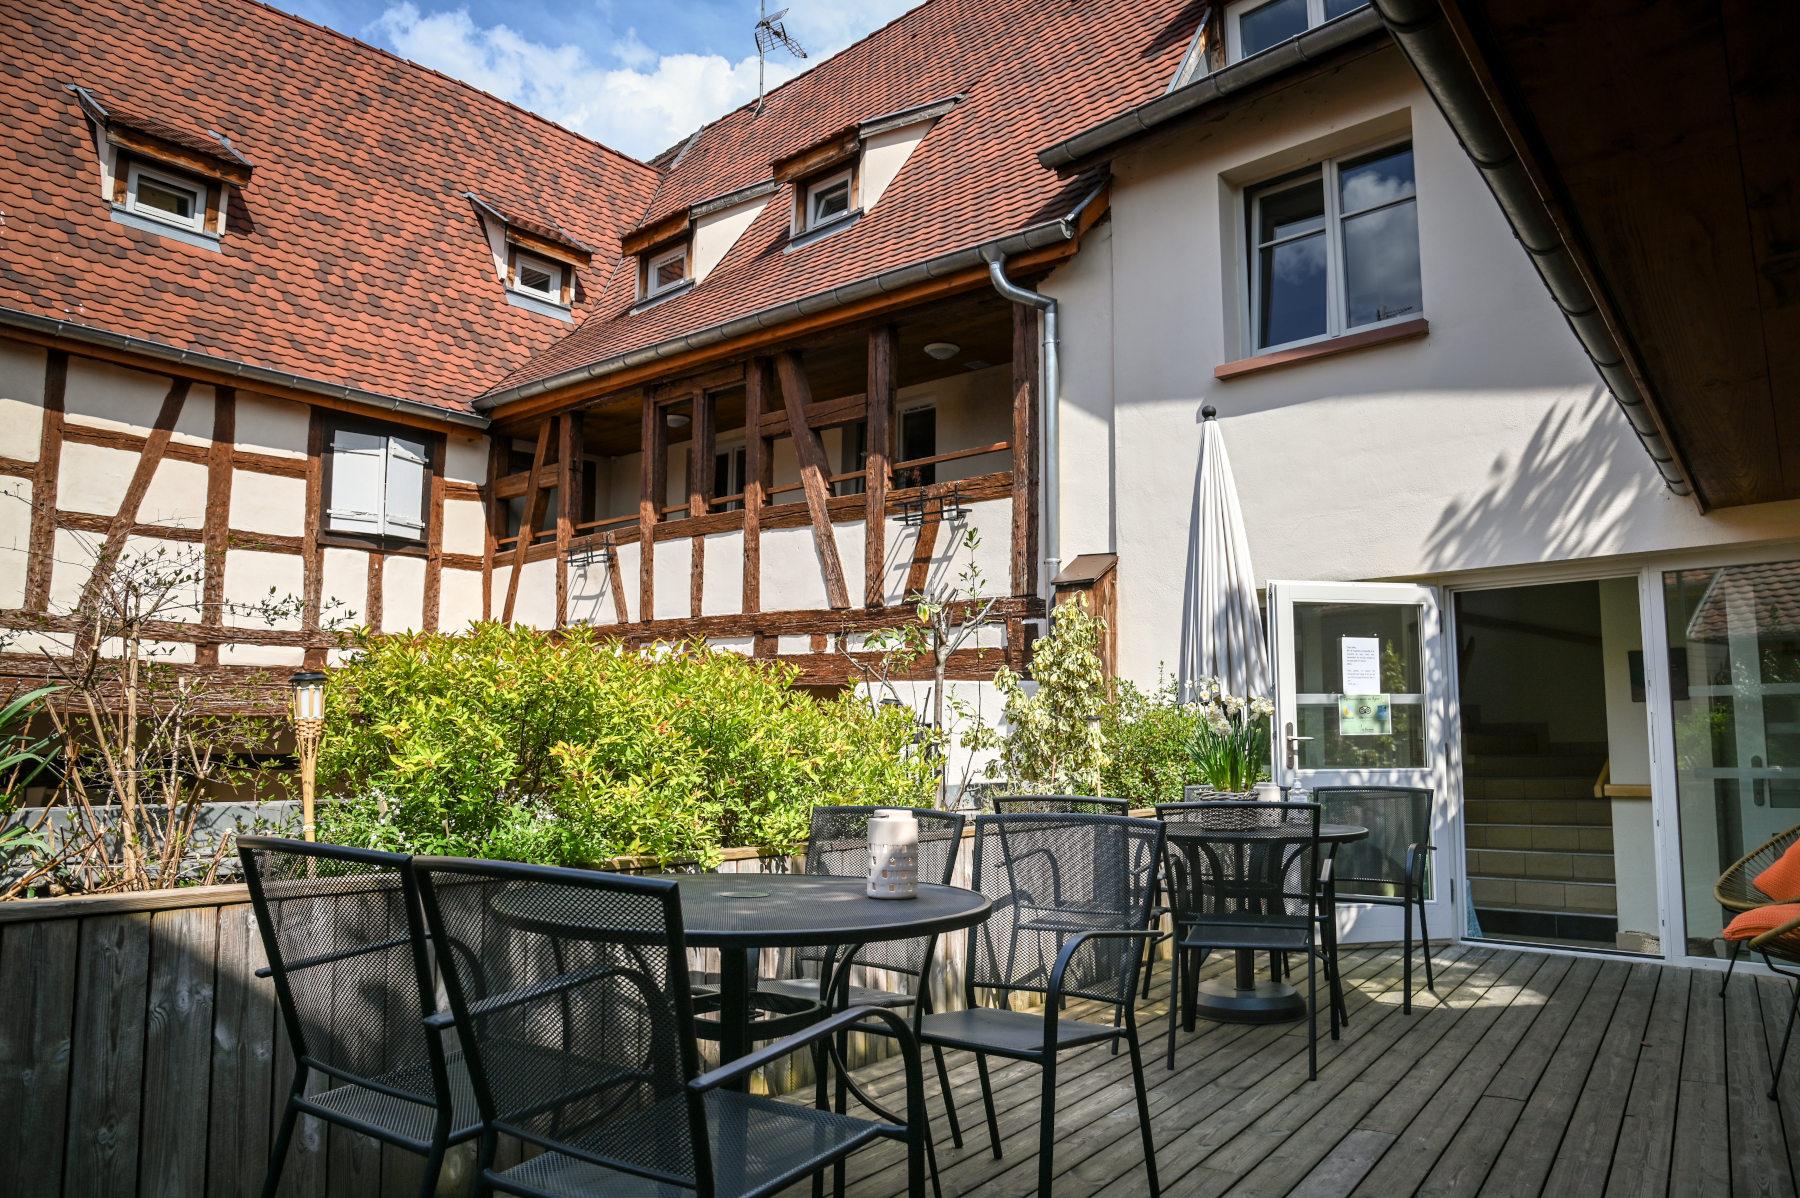 Gîte Guillaume - 6 pers. - Le Hameau d'Eguisheim - Domaine GINGLINGER